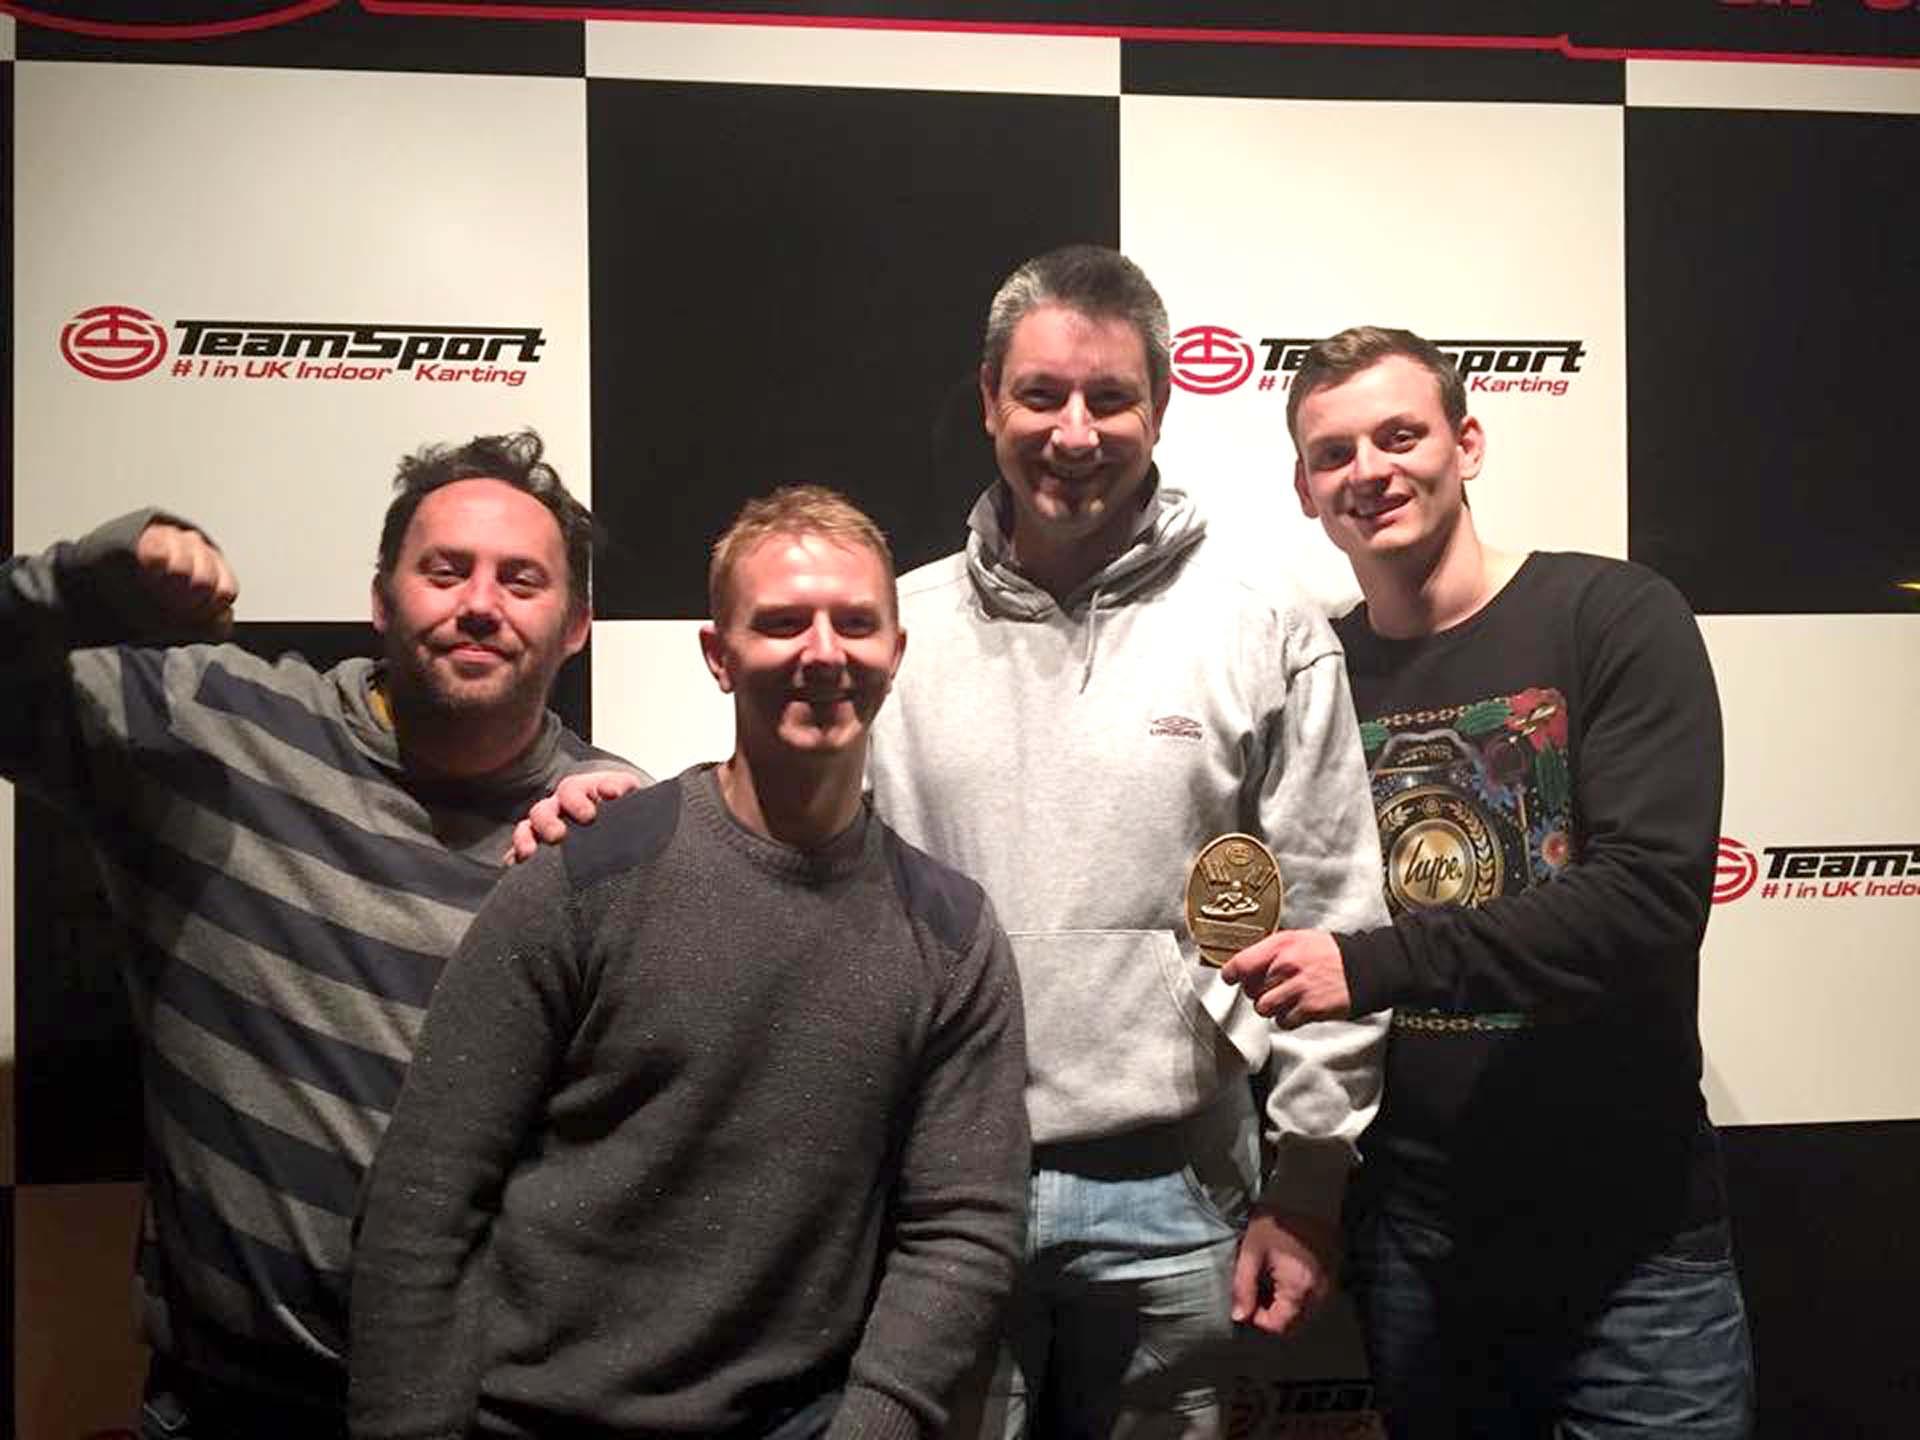 Phil, Tony, Simon and Bradley Go-Karting